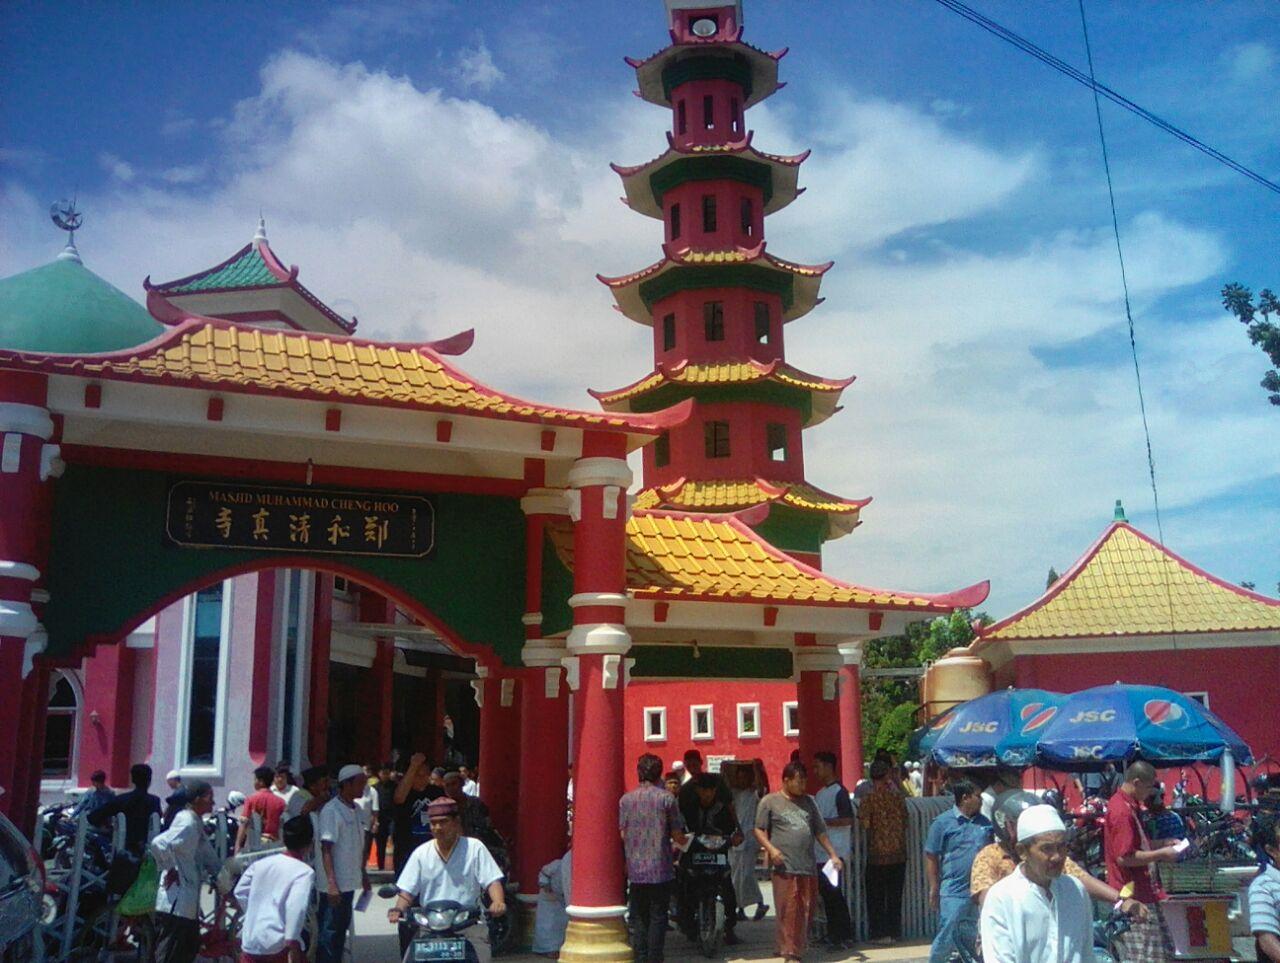 Kulturasi Budaya Masjid Cheng Hoo Palembang Klikanggaran Rumah Tahfidz Digunakan